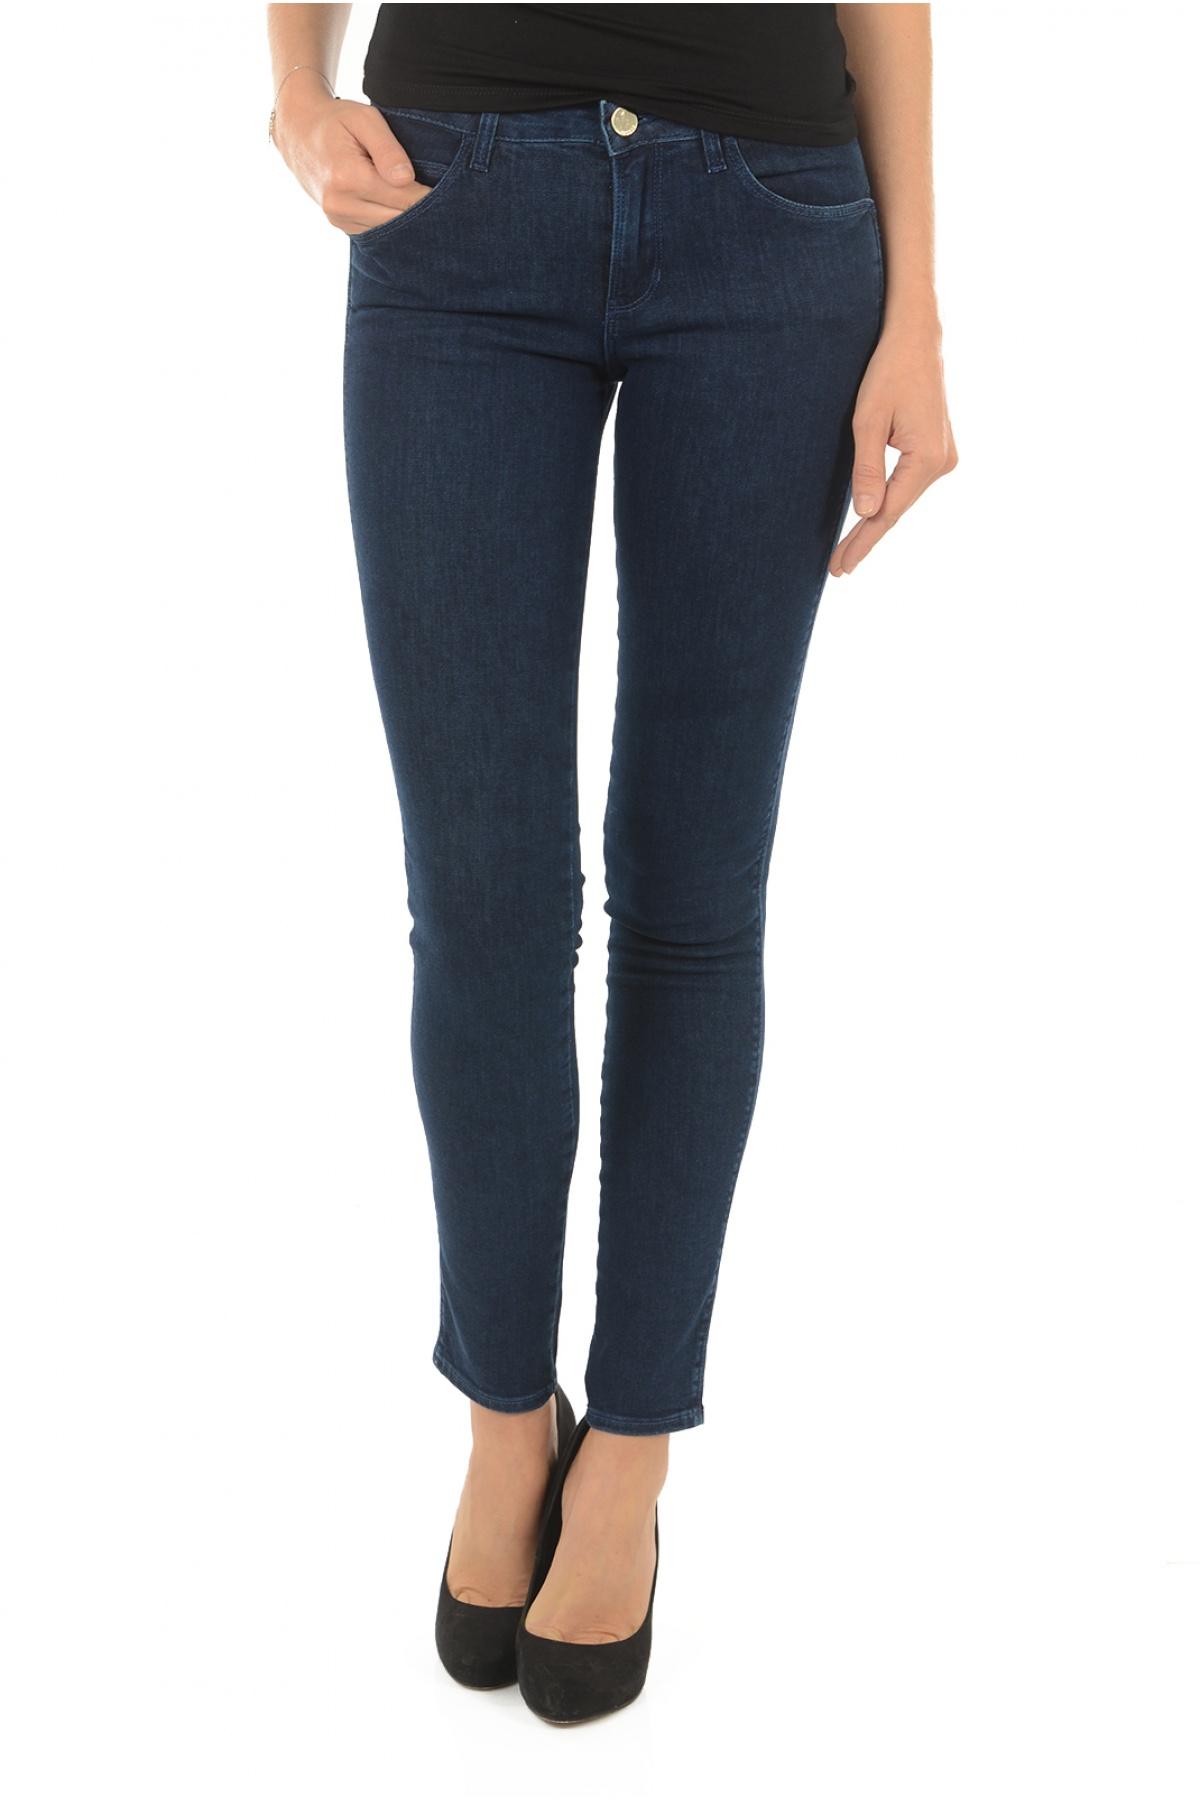 Jeans Slim Jeans